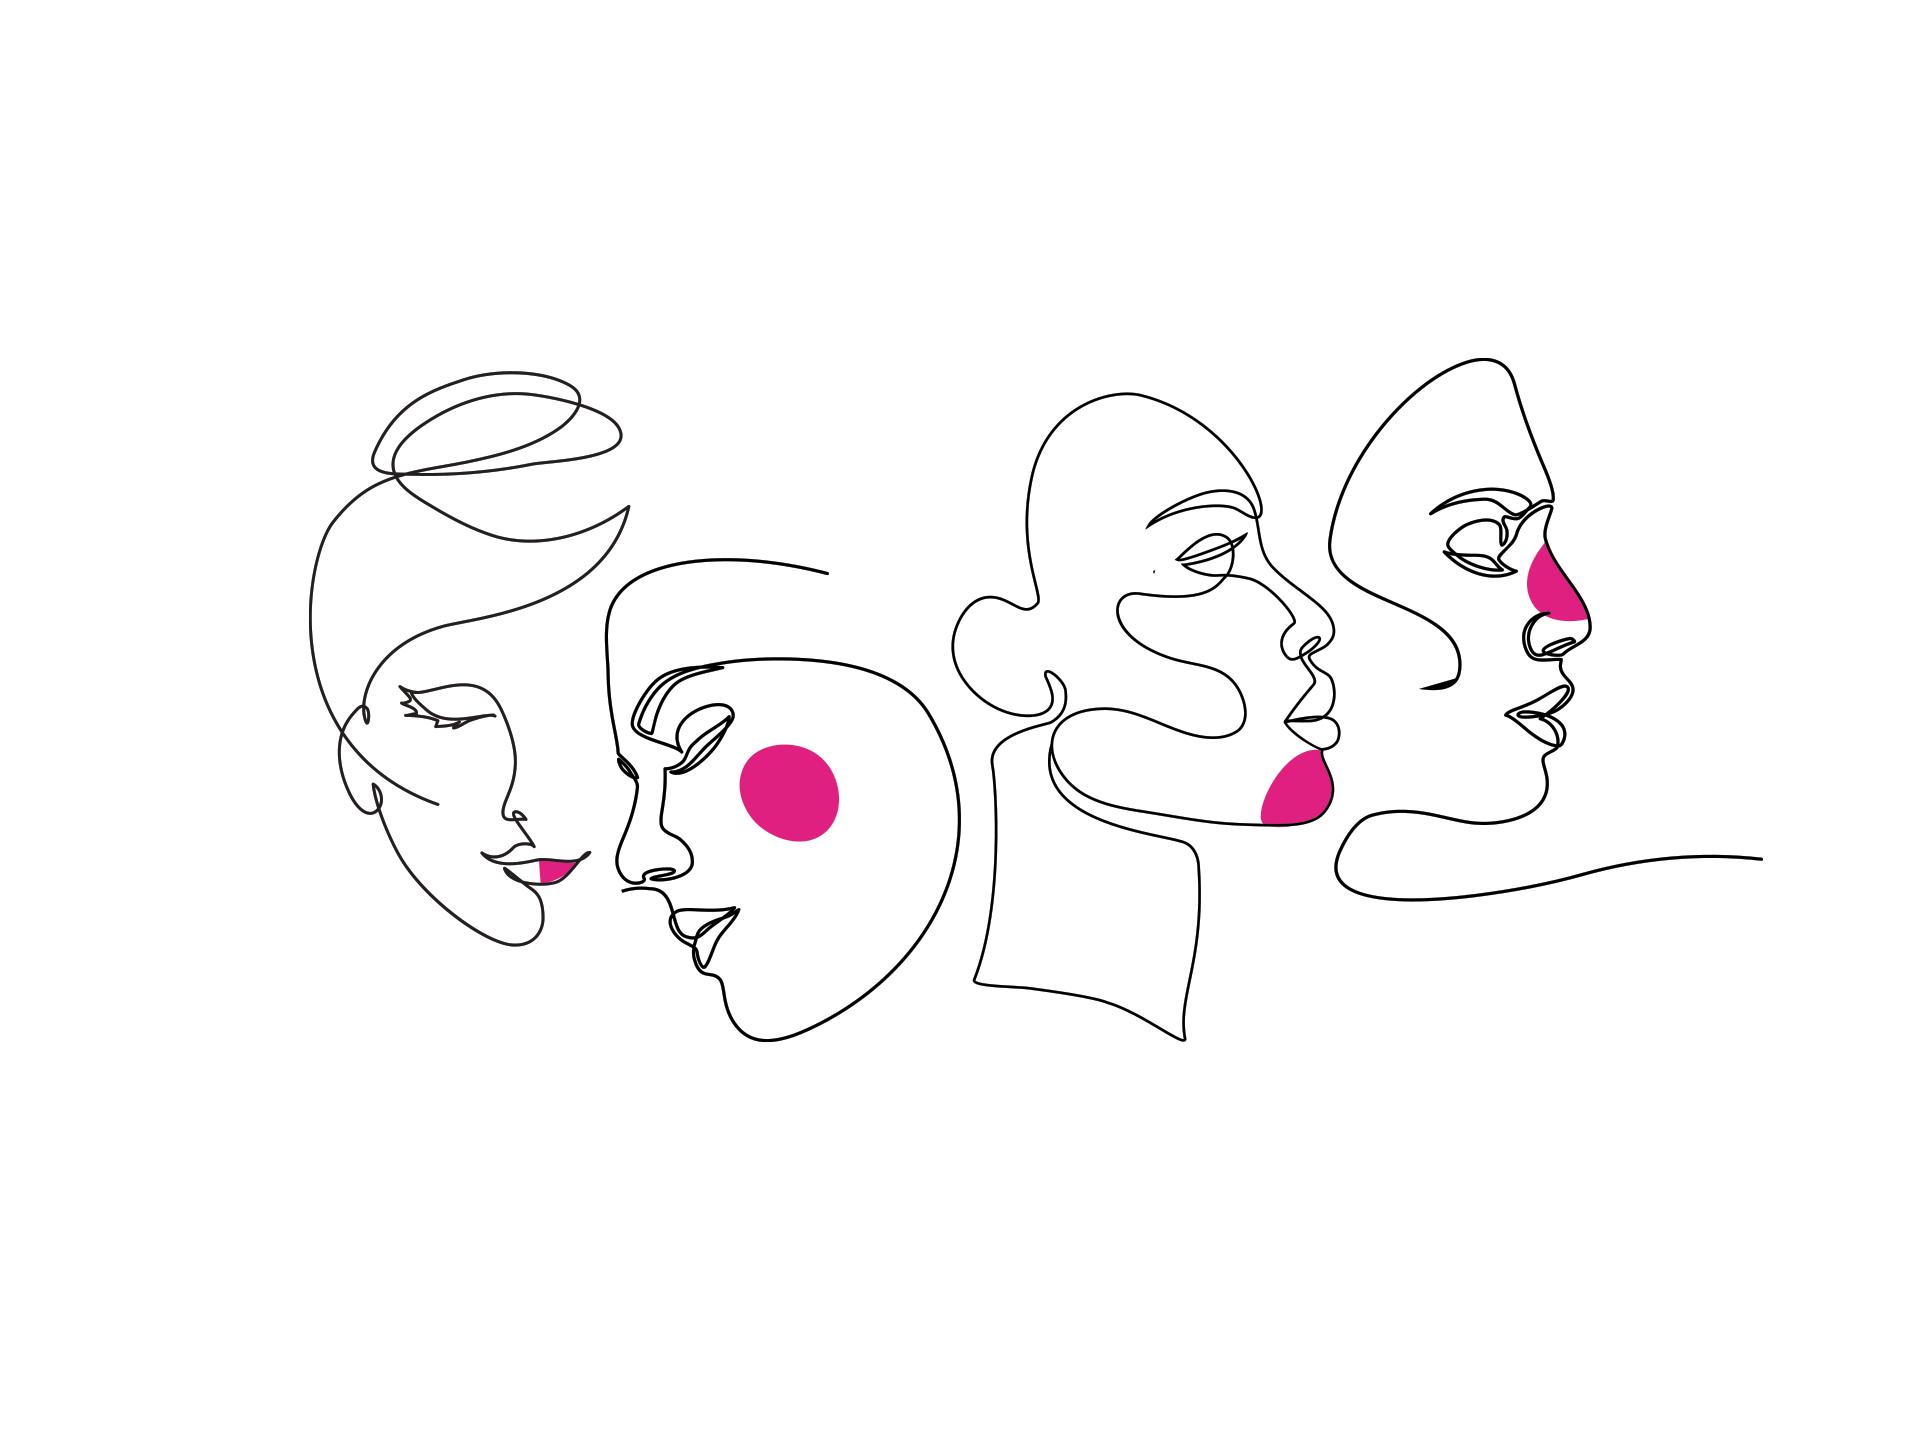 mulheres com tinta rosa no corpo